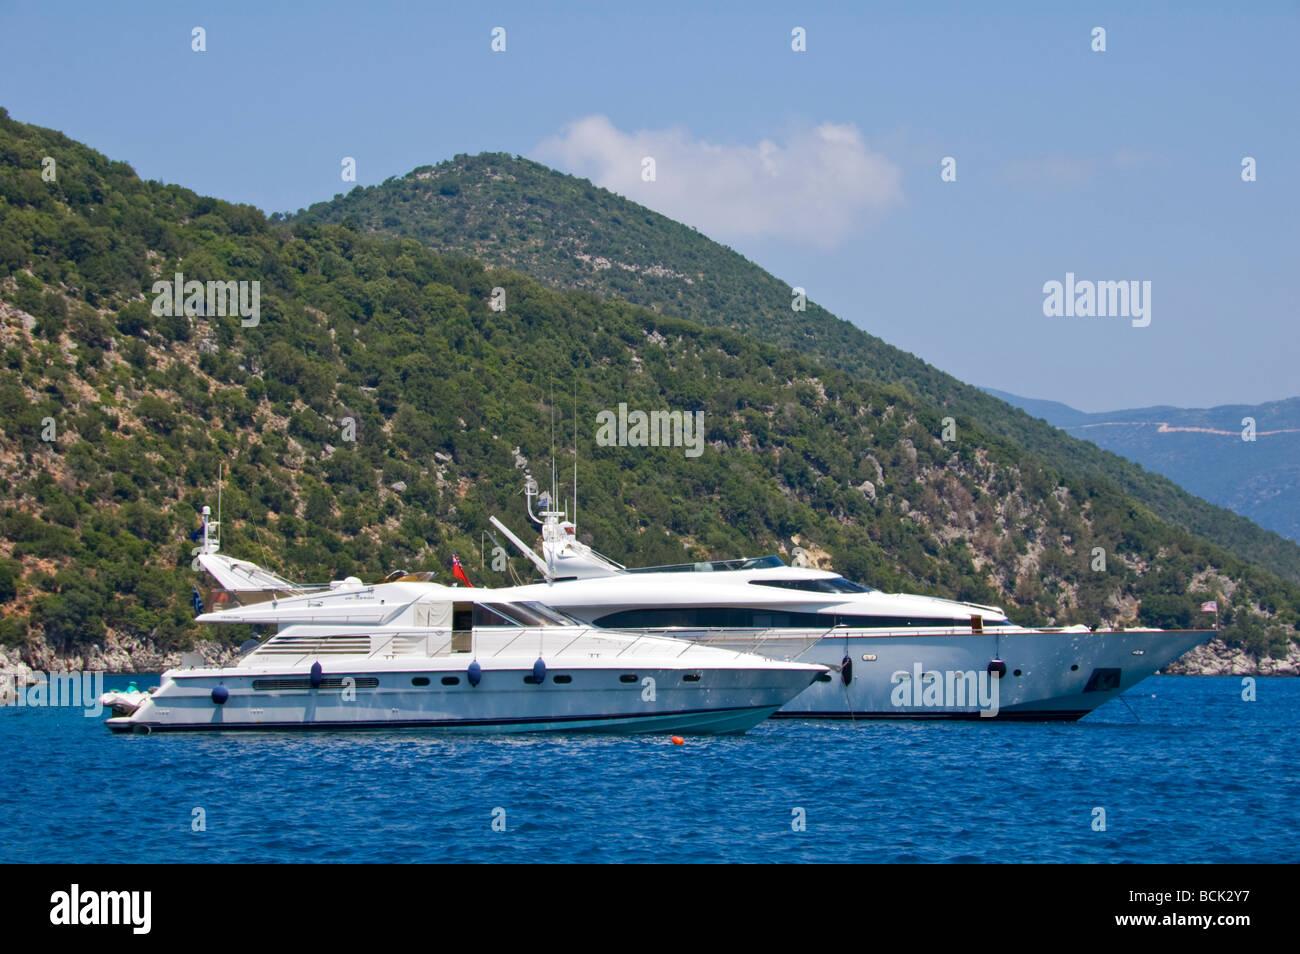 Luxury cruisers moored off Antisamos beach near Sami on the Greek island of Kefalonia Greece GR - Stock Image